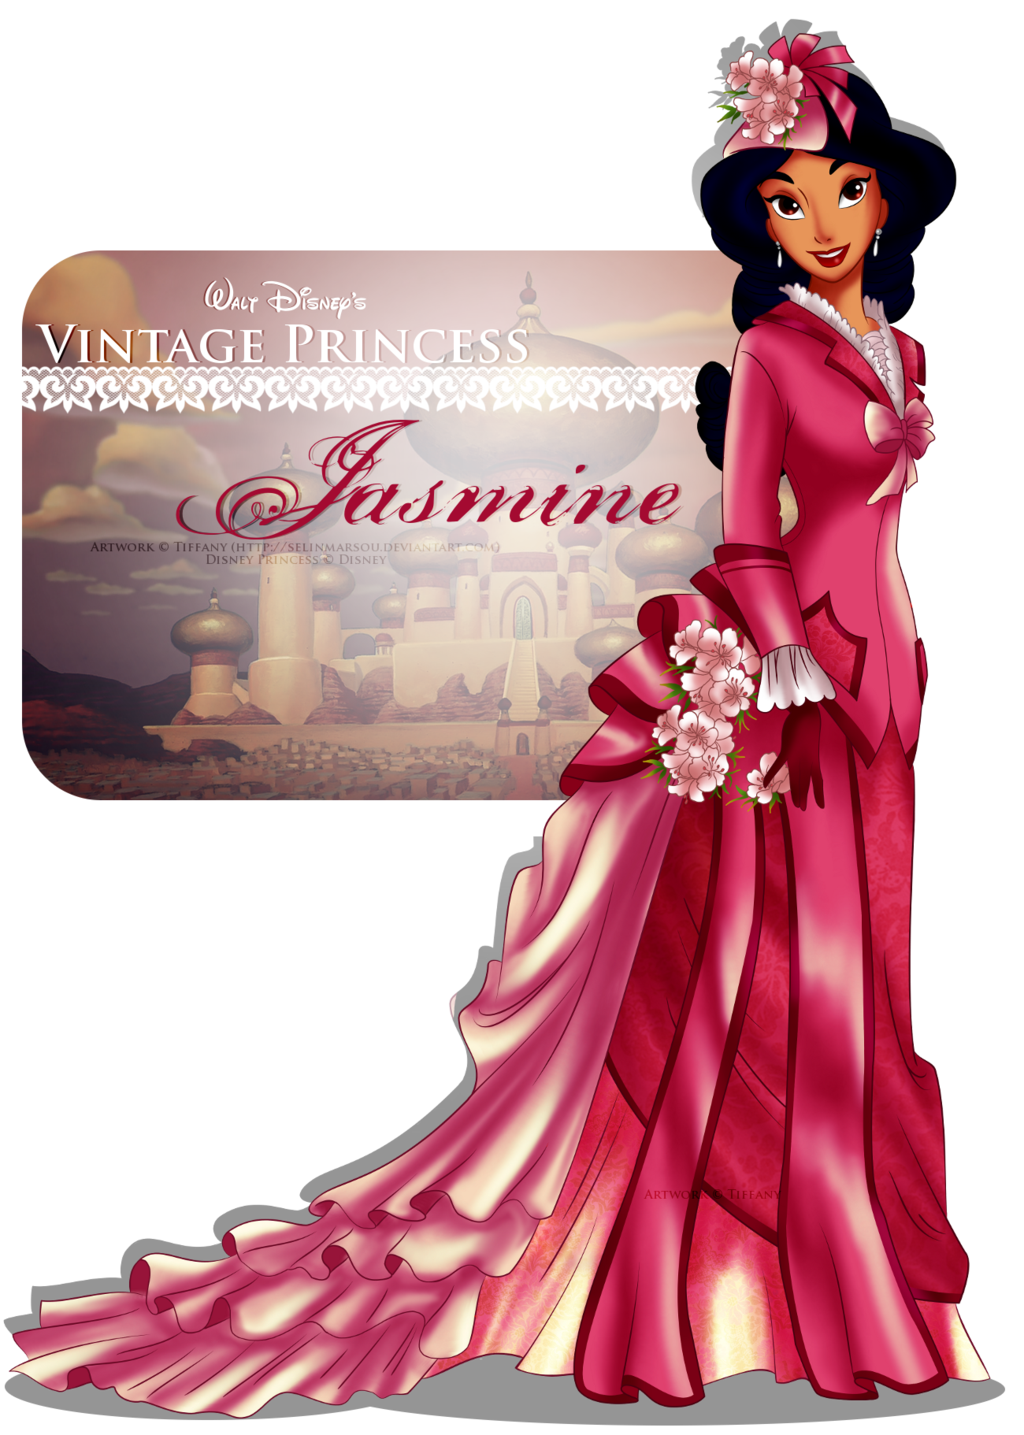 Jasmine by Tiffany [©2012-2014 selinmarsou]